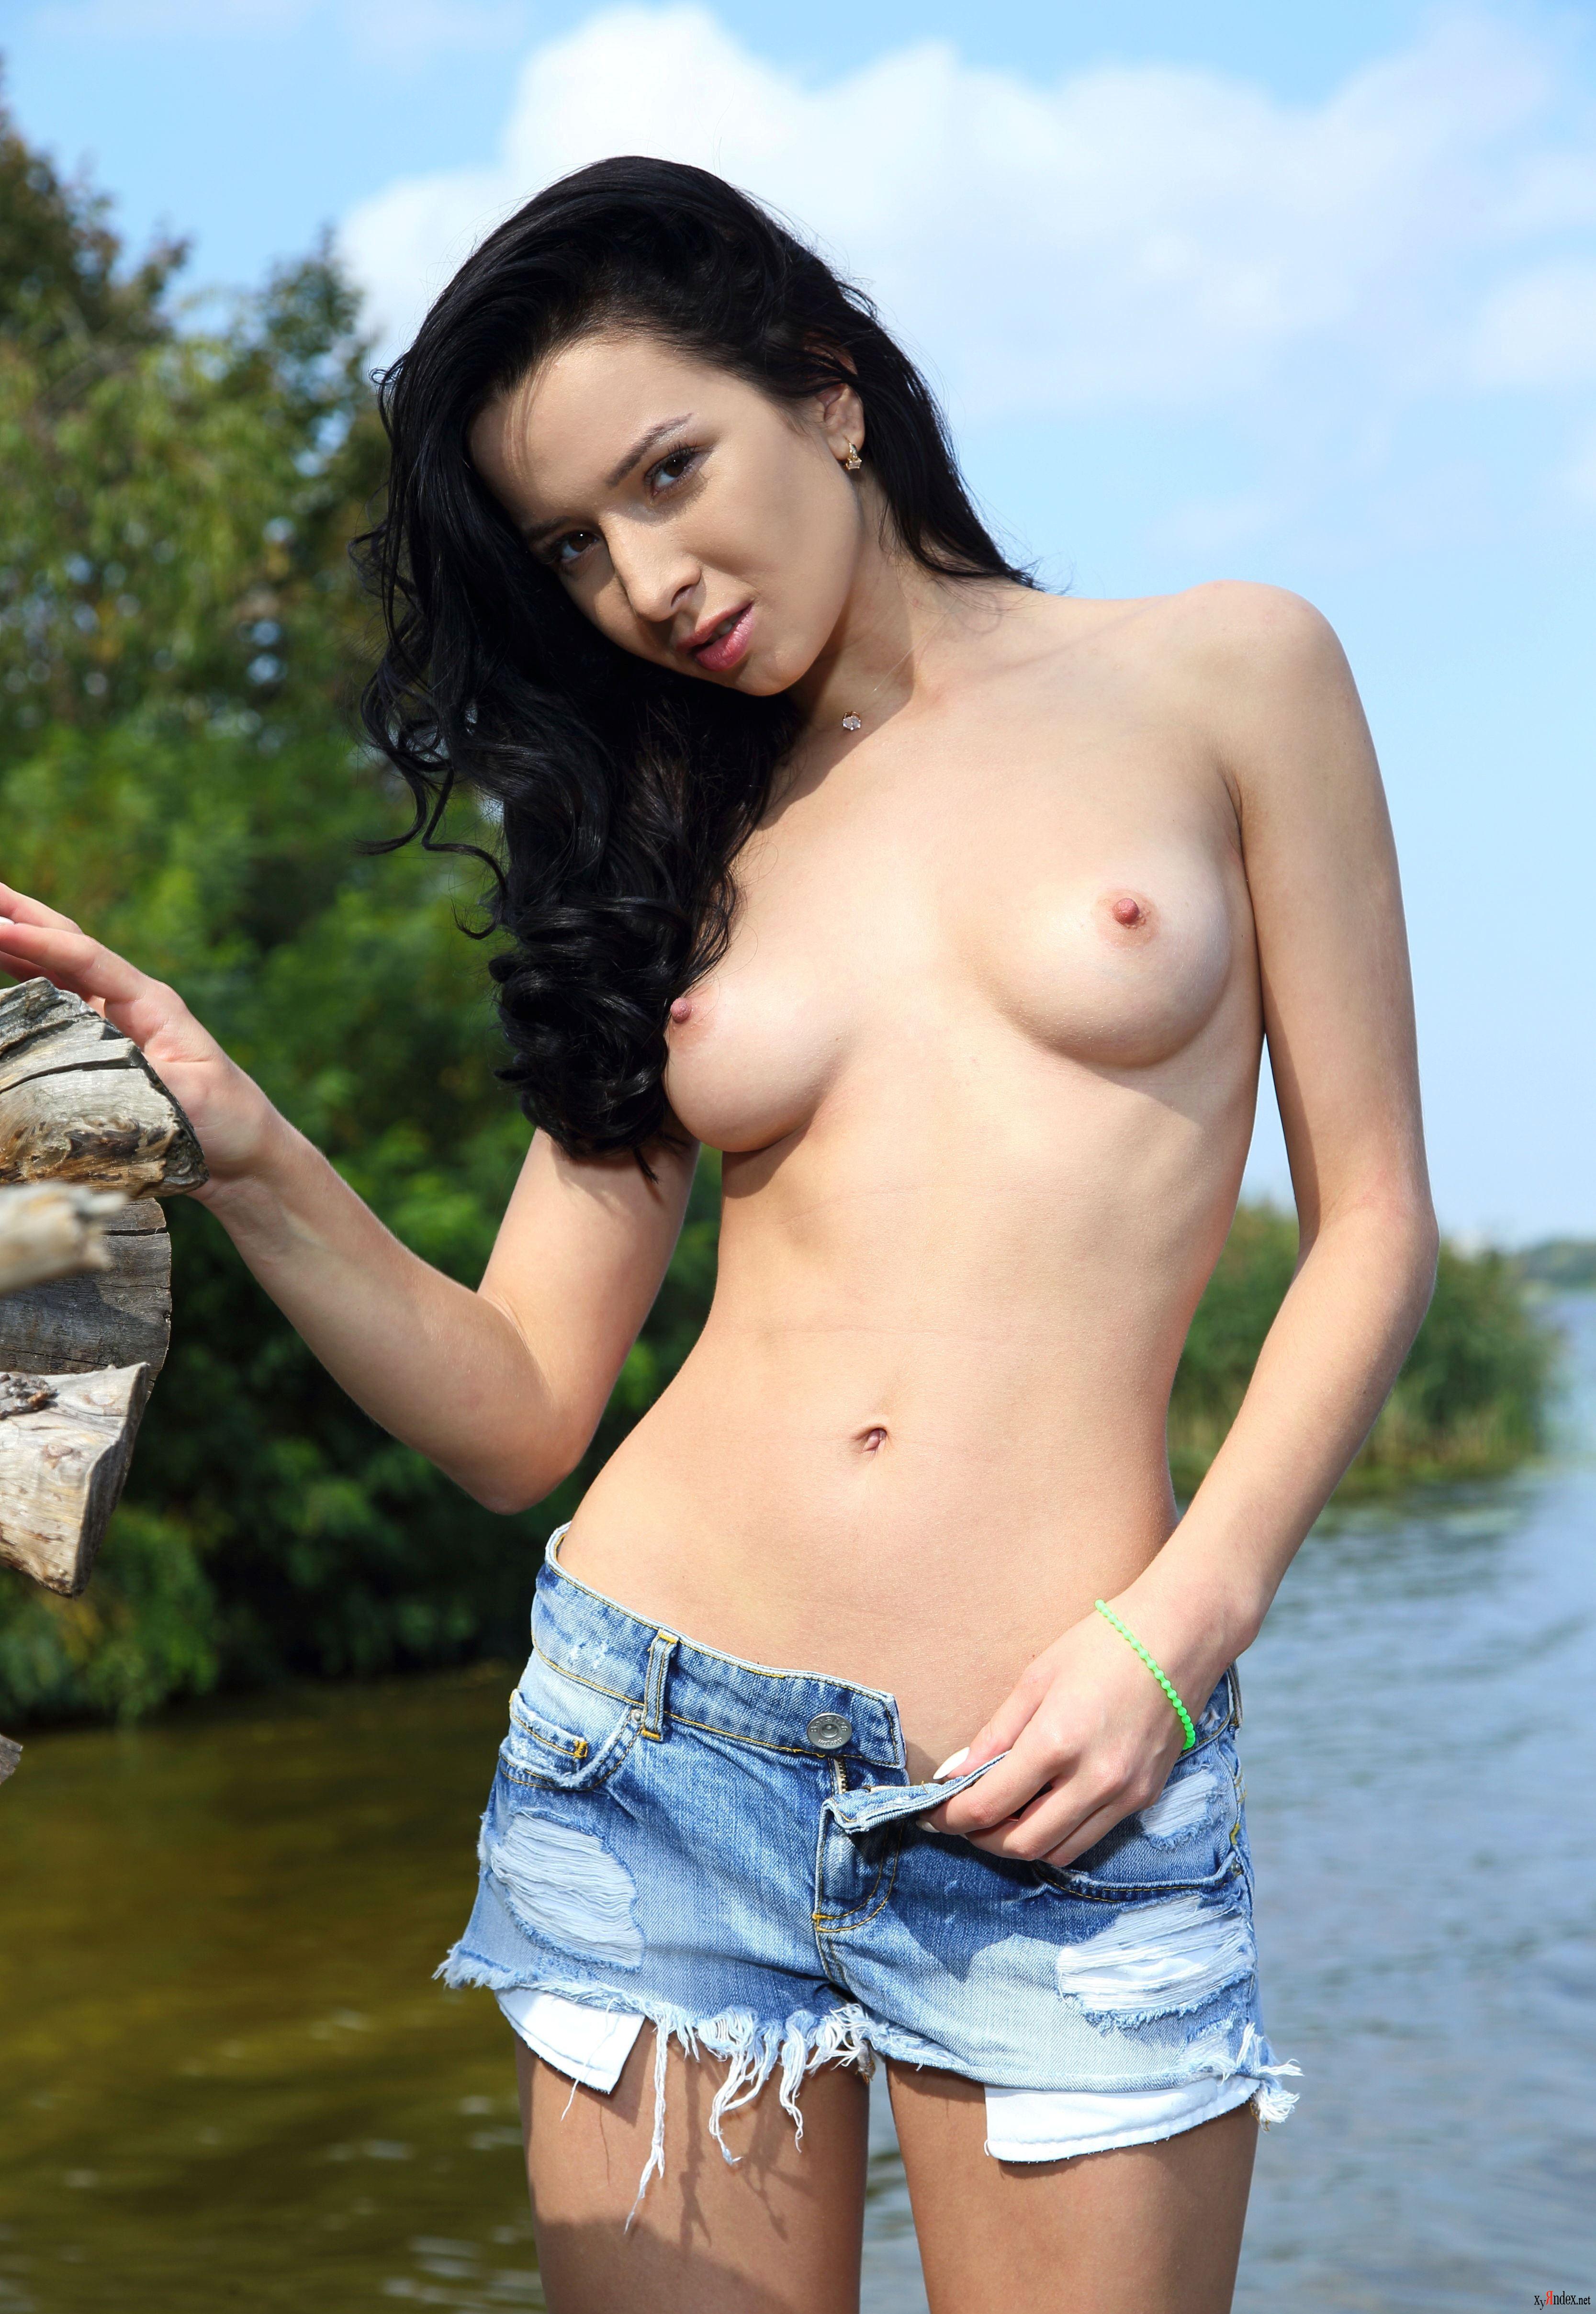 eroticheskie-foto-aureliya-sharipova